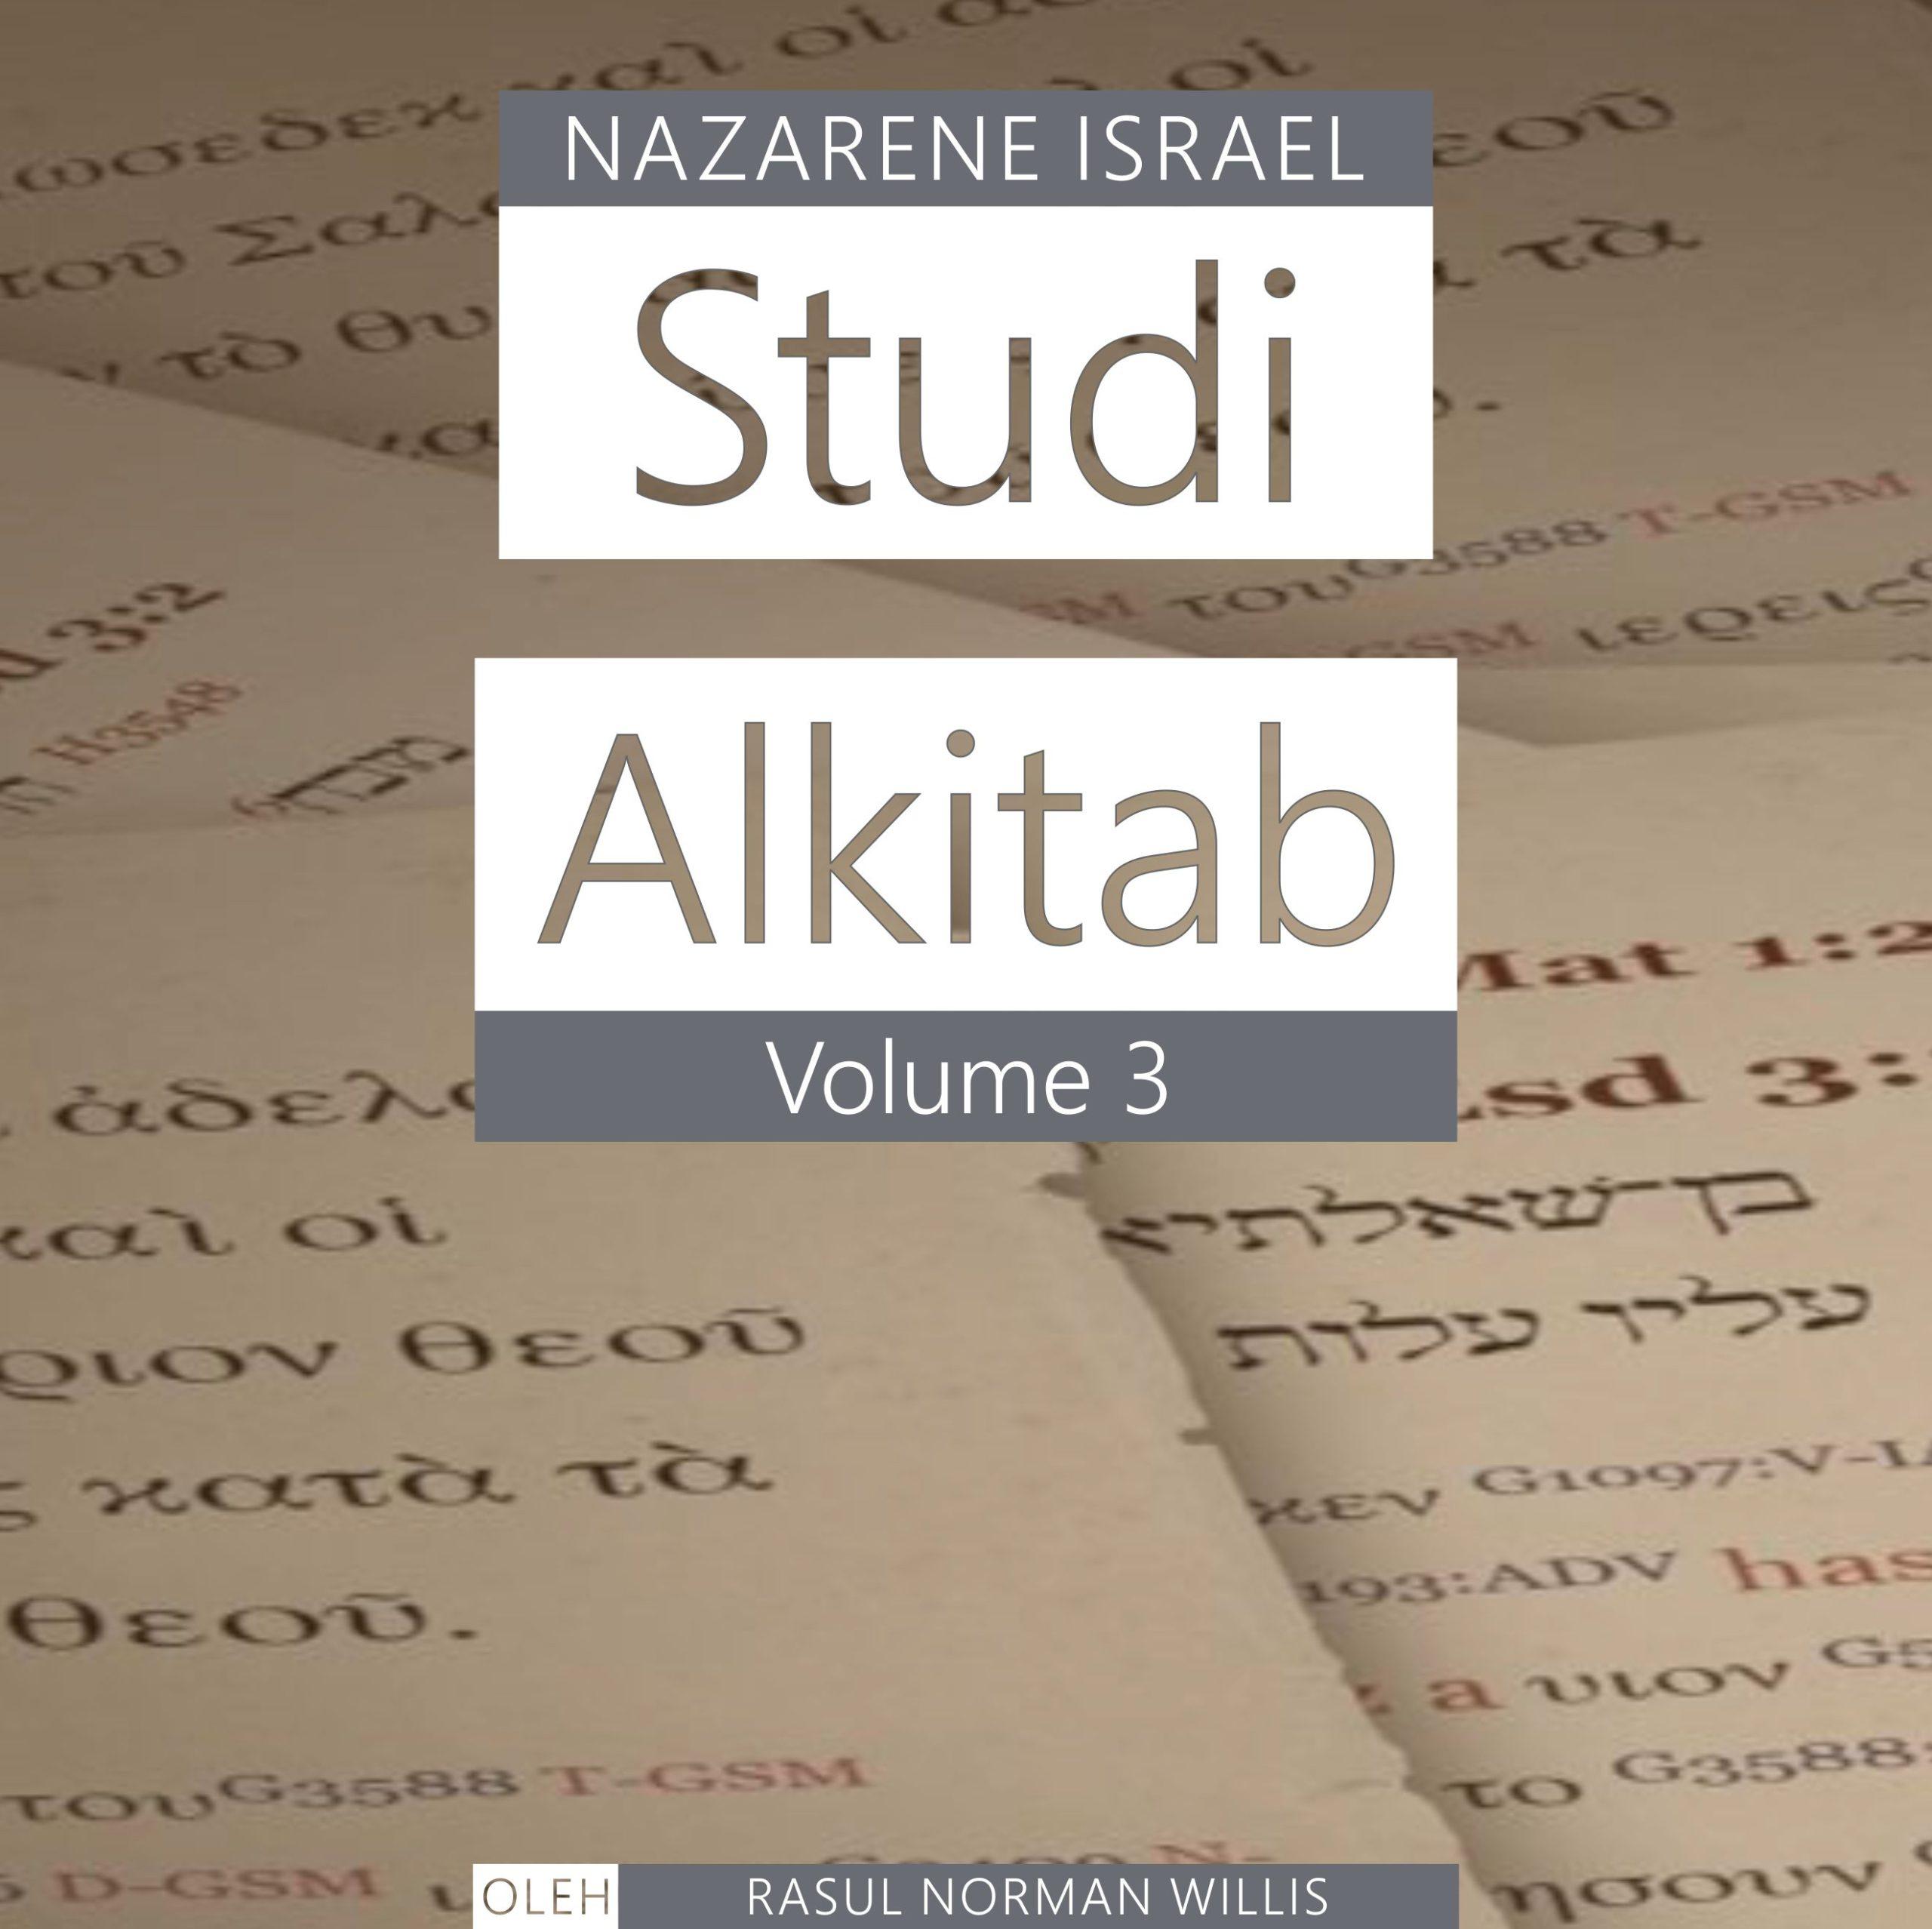 Studi Alkitab Nazaret Vol. 3